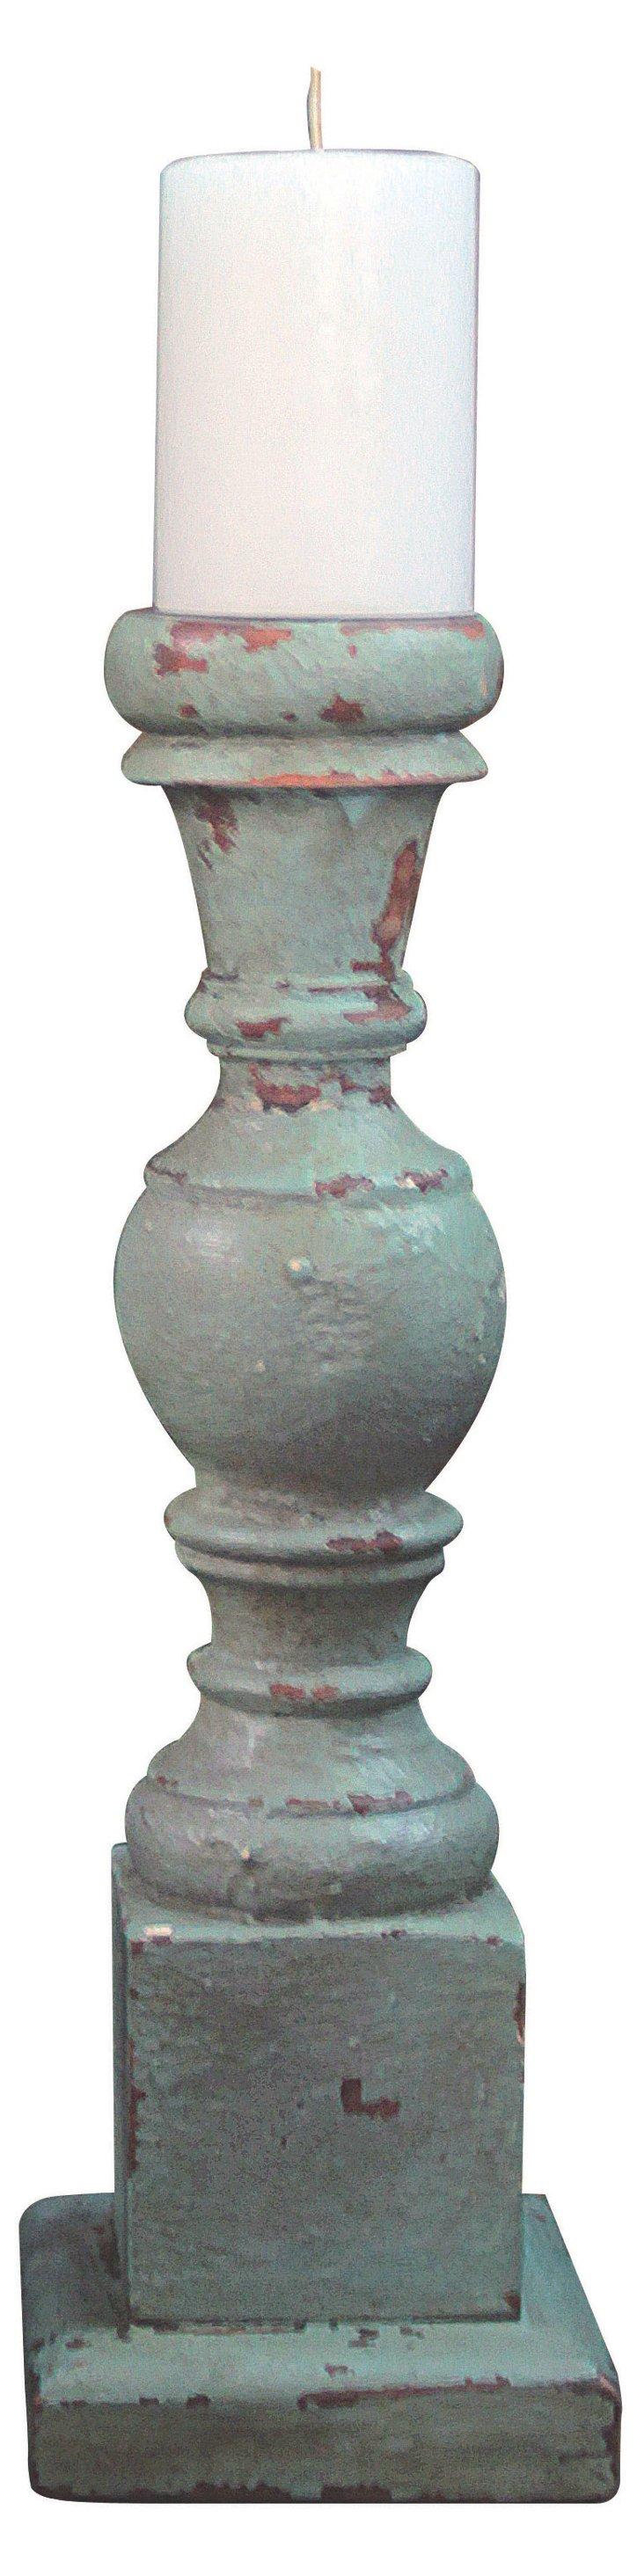 "18"" Hand-Carved Mango Wood Candleholder"